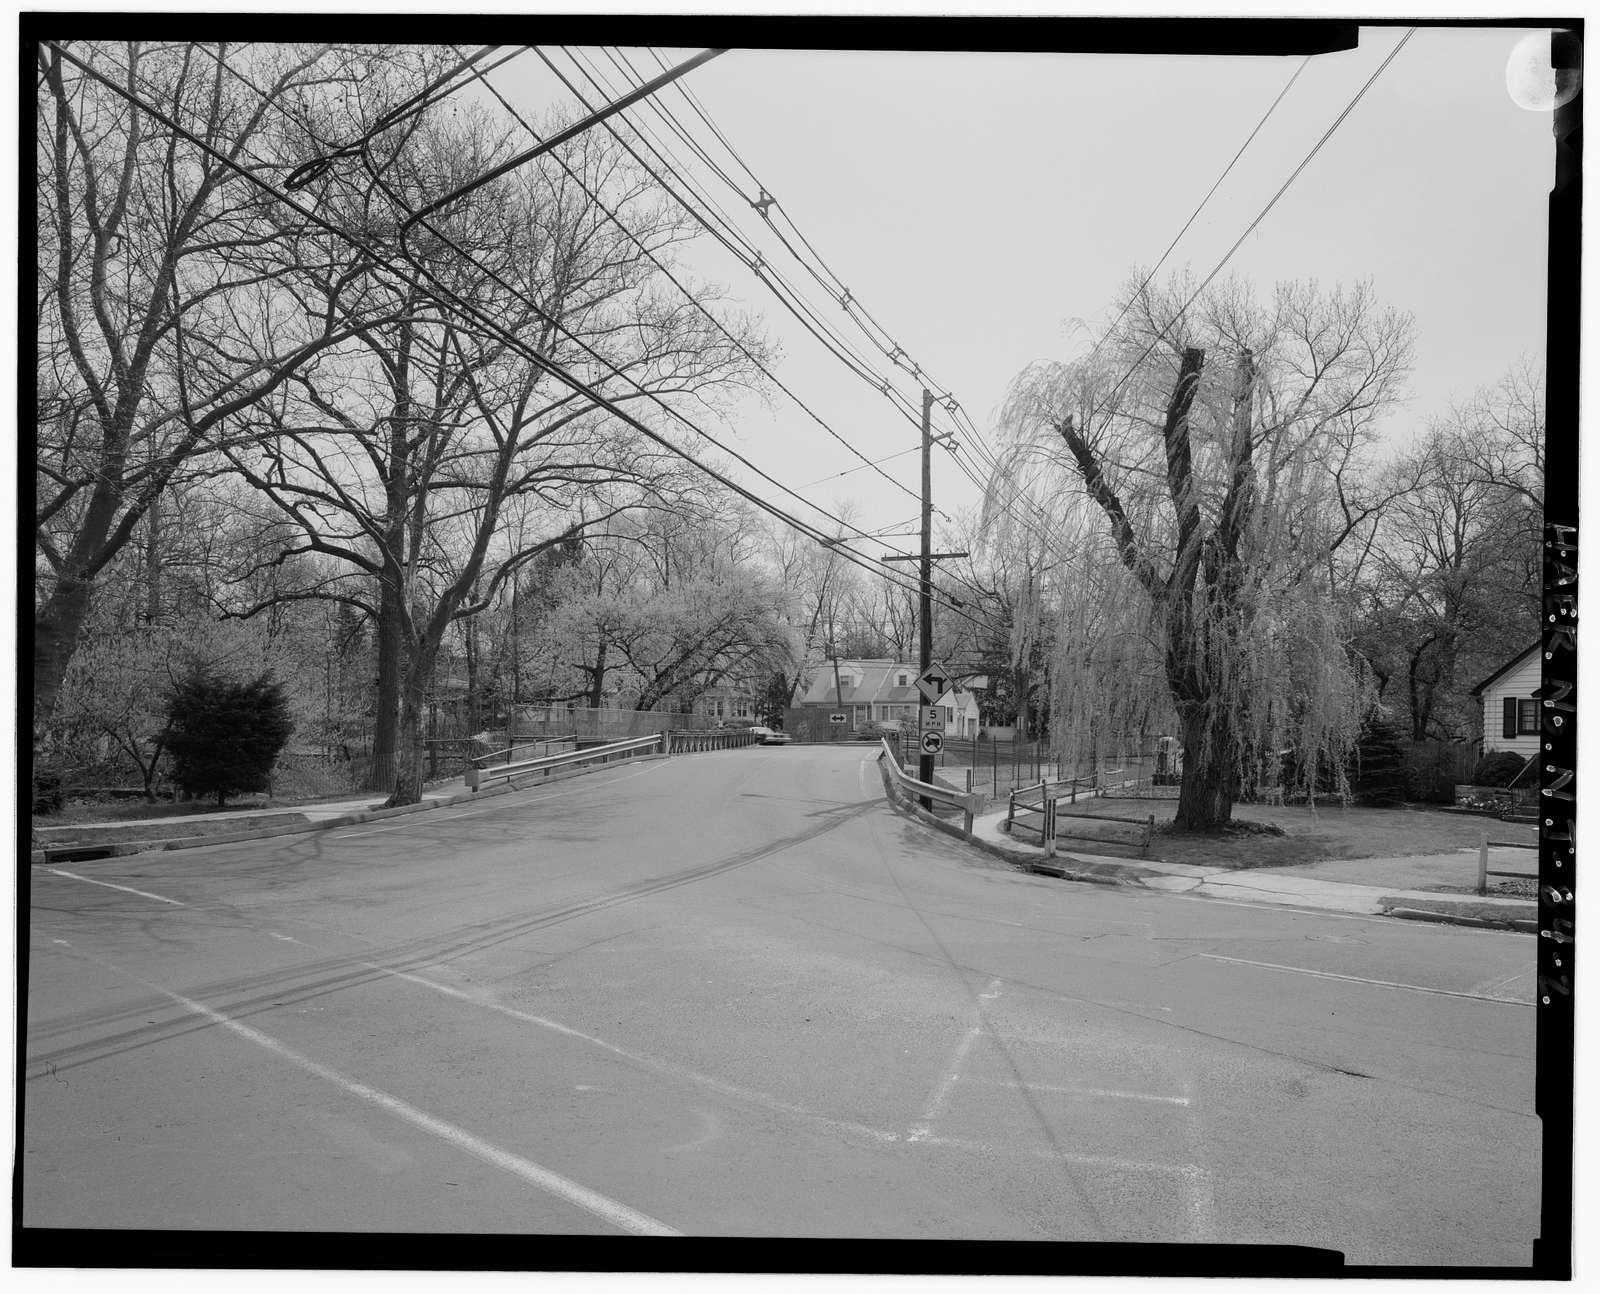 Lincoln Avenue-High Street Bridge, Spanning Rahway River at Lincoln Avenue & High Street, Cranford, Union County, NJ